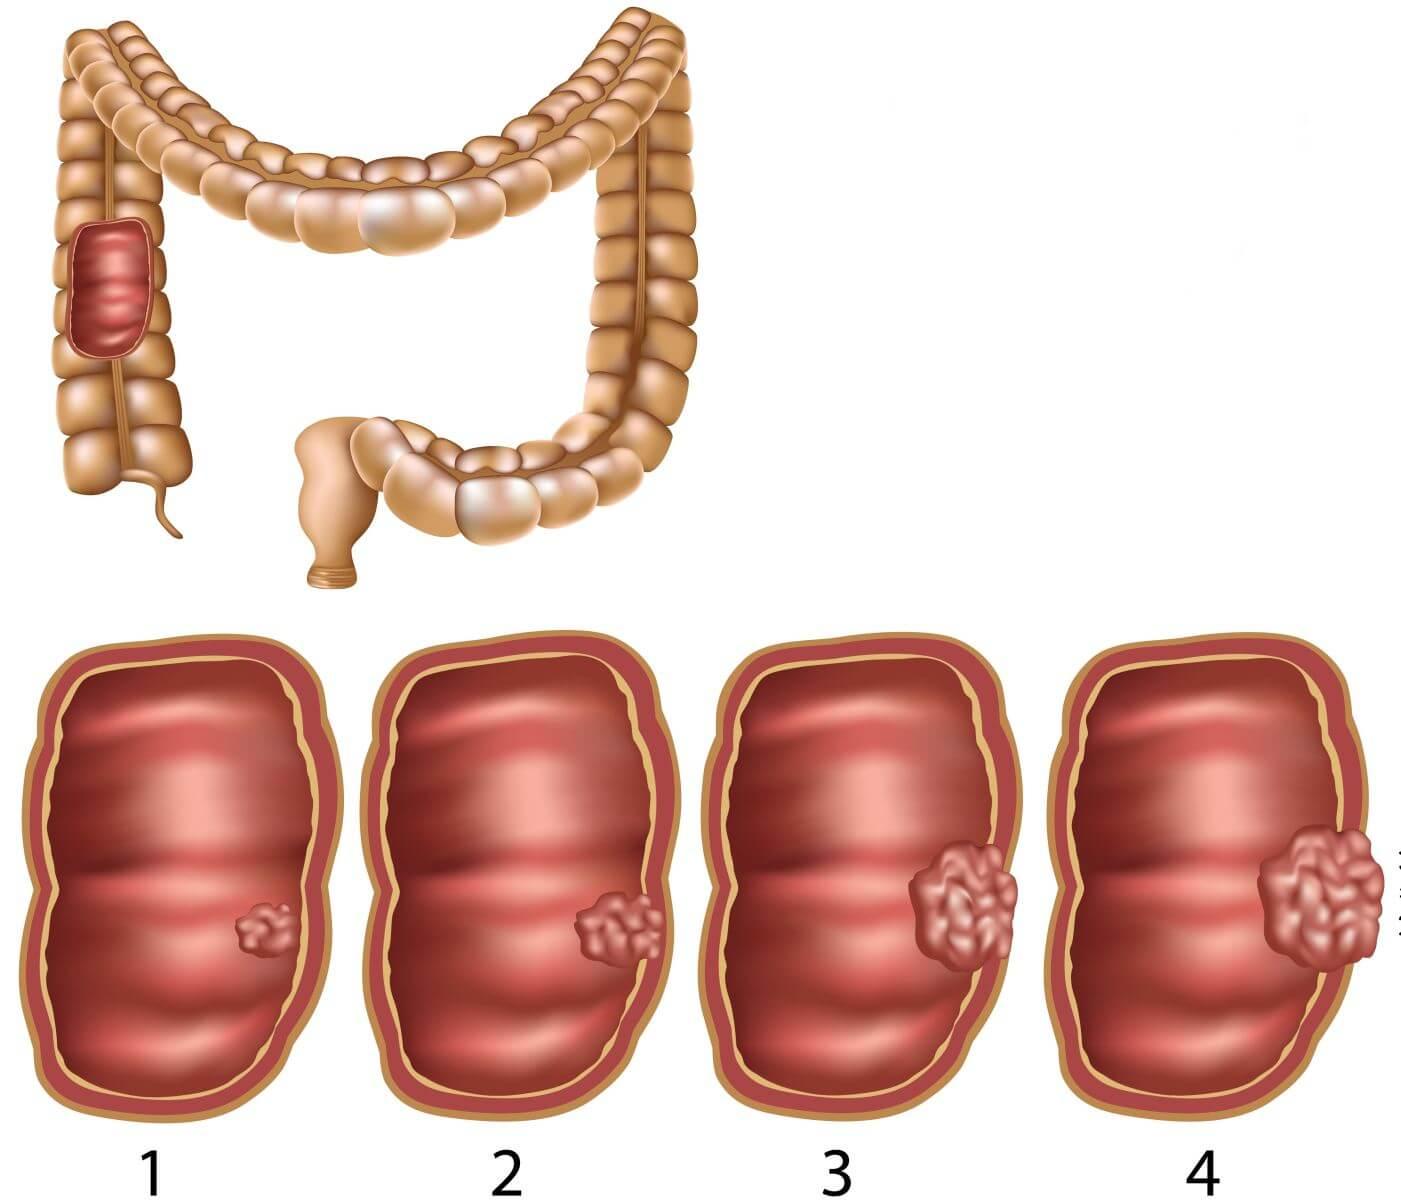 рак кишечника классификация по стадиям